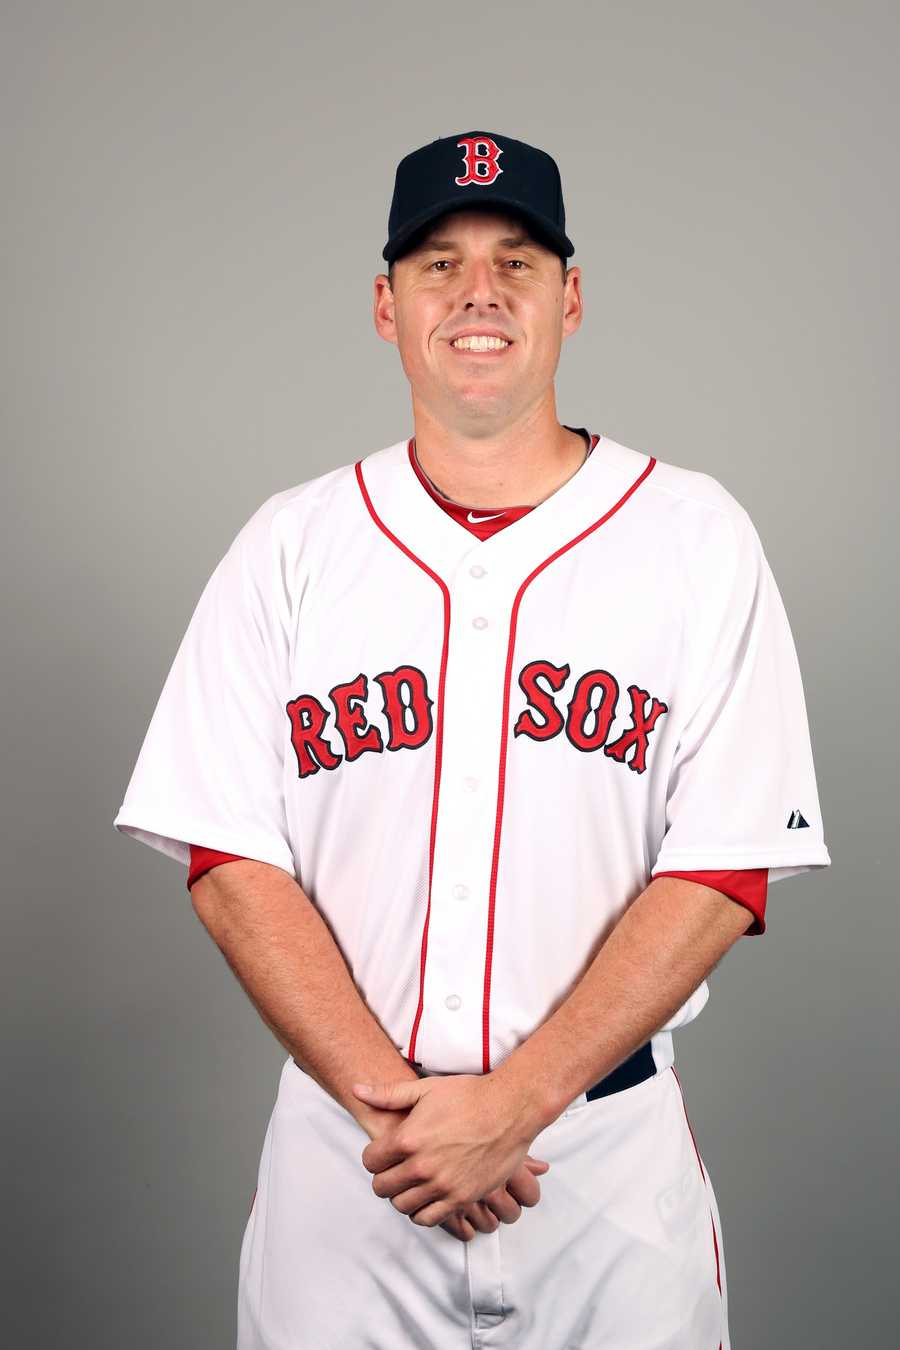 #41 John Lackey, pitcher - $15.95 million